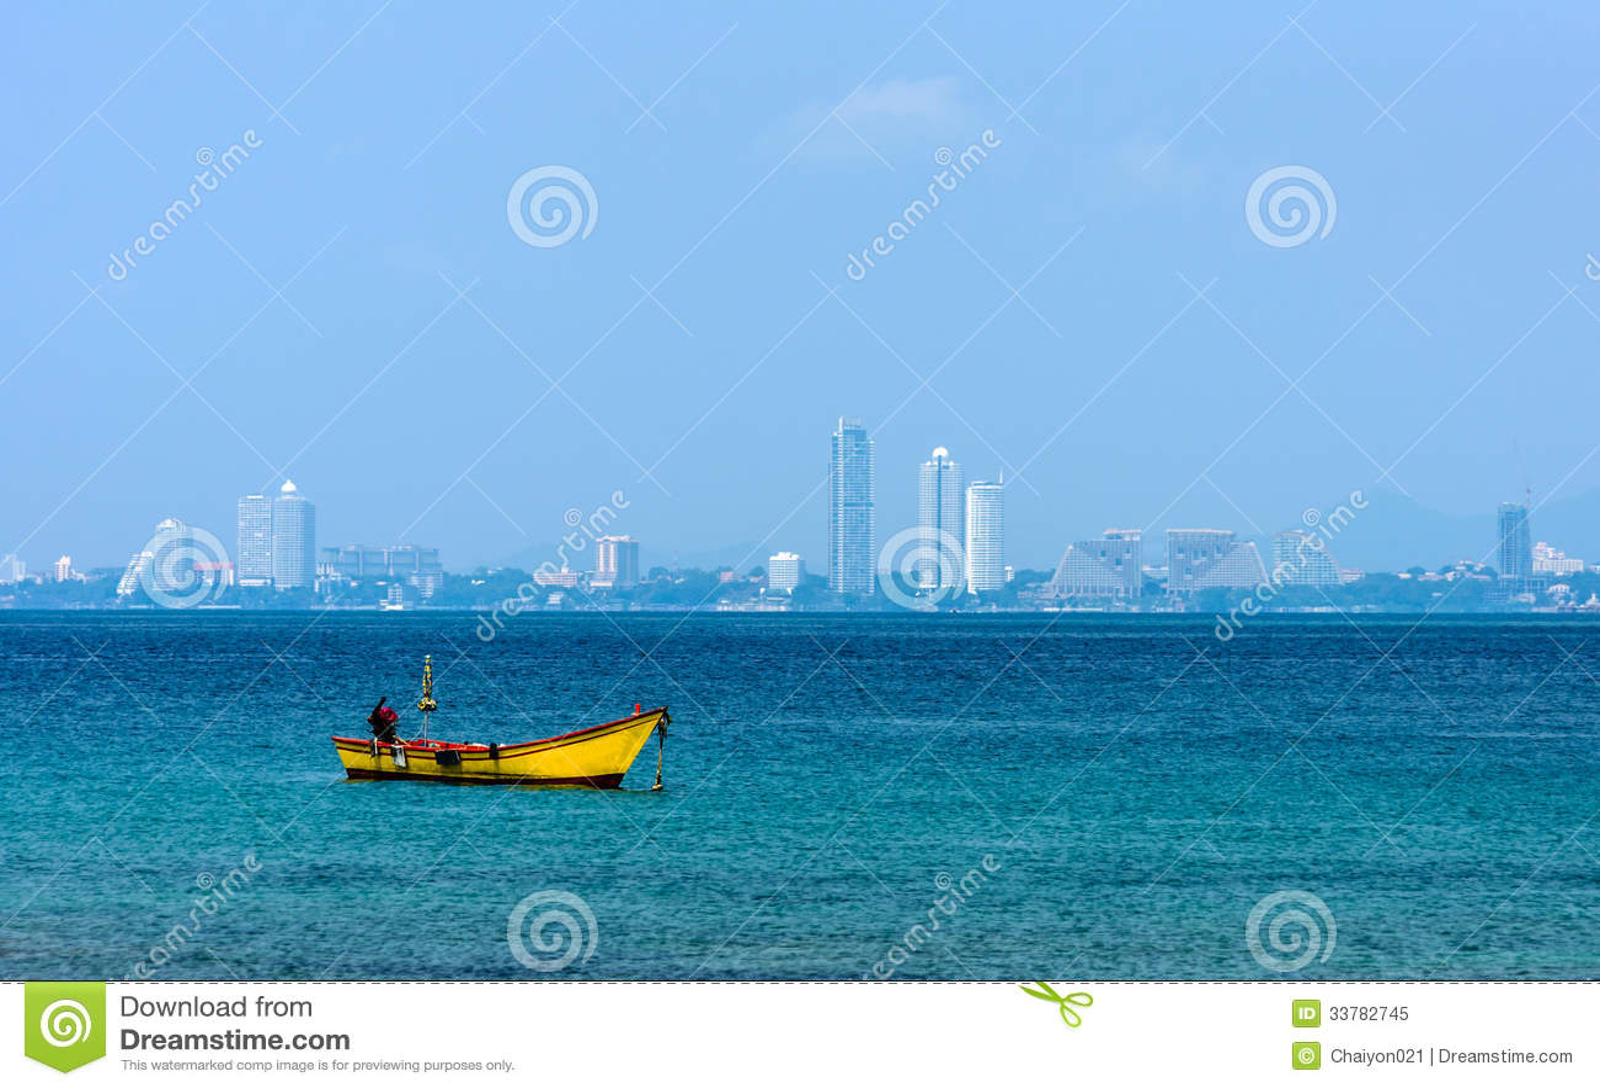 Small Fishing Boats On The Sea Royalty Free Stock Photo - Image ...